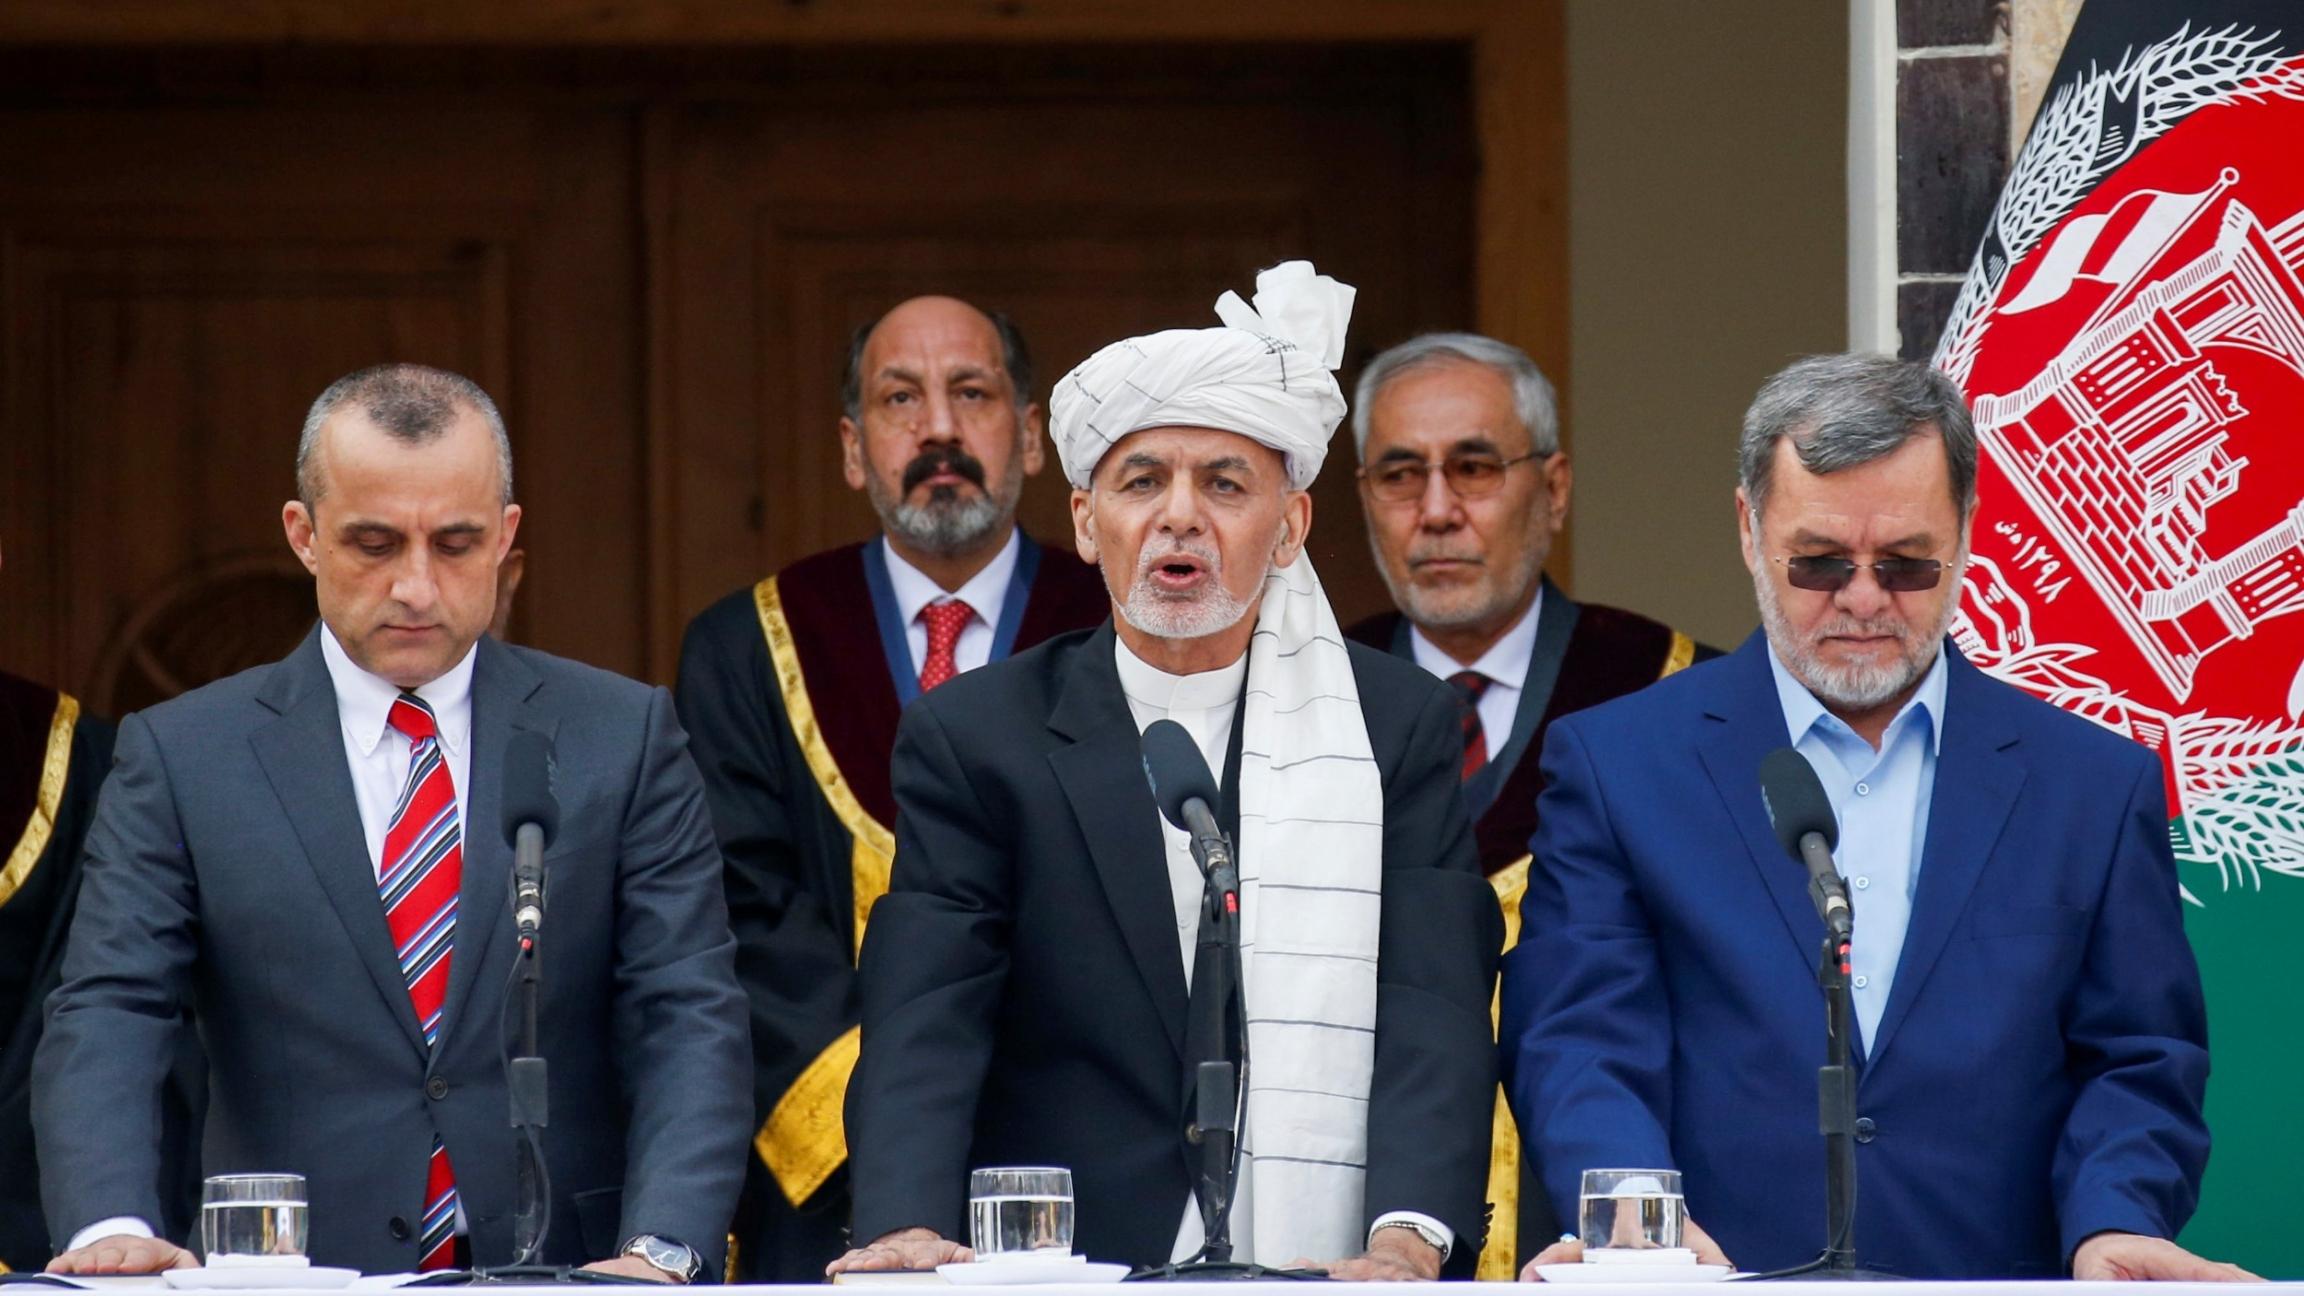 Afghanistan'sPresidentAshraf Ghani, center, his firstVicePresidentAmrullahSaleh, left, and secondVicePresidentSarwar Danish, right, taketheoath of office during their inauguration, in Kabul, Afghanistan, March 9, 2020.